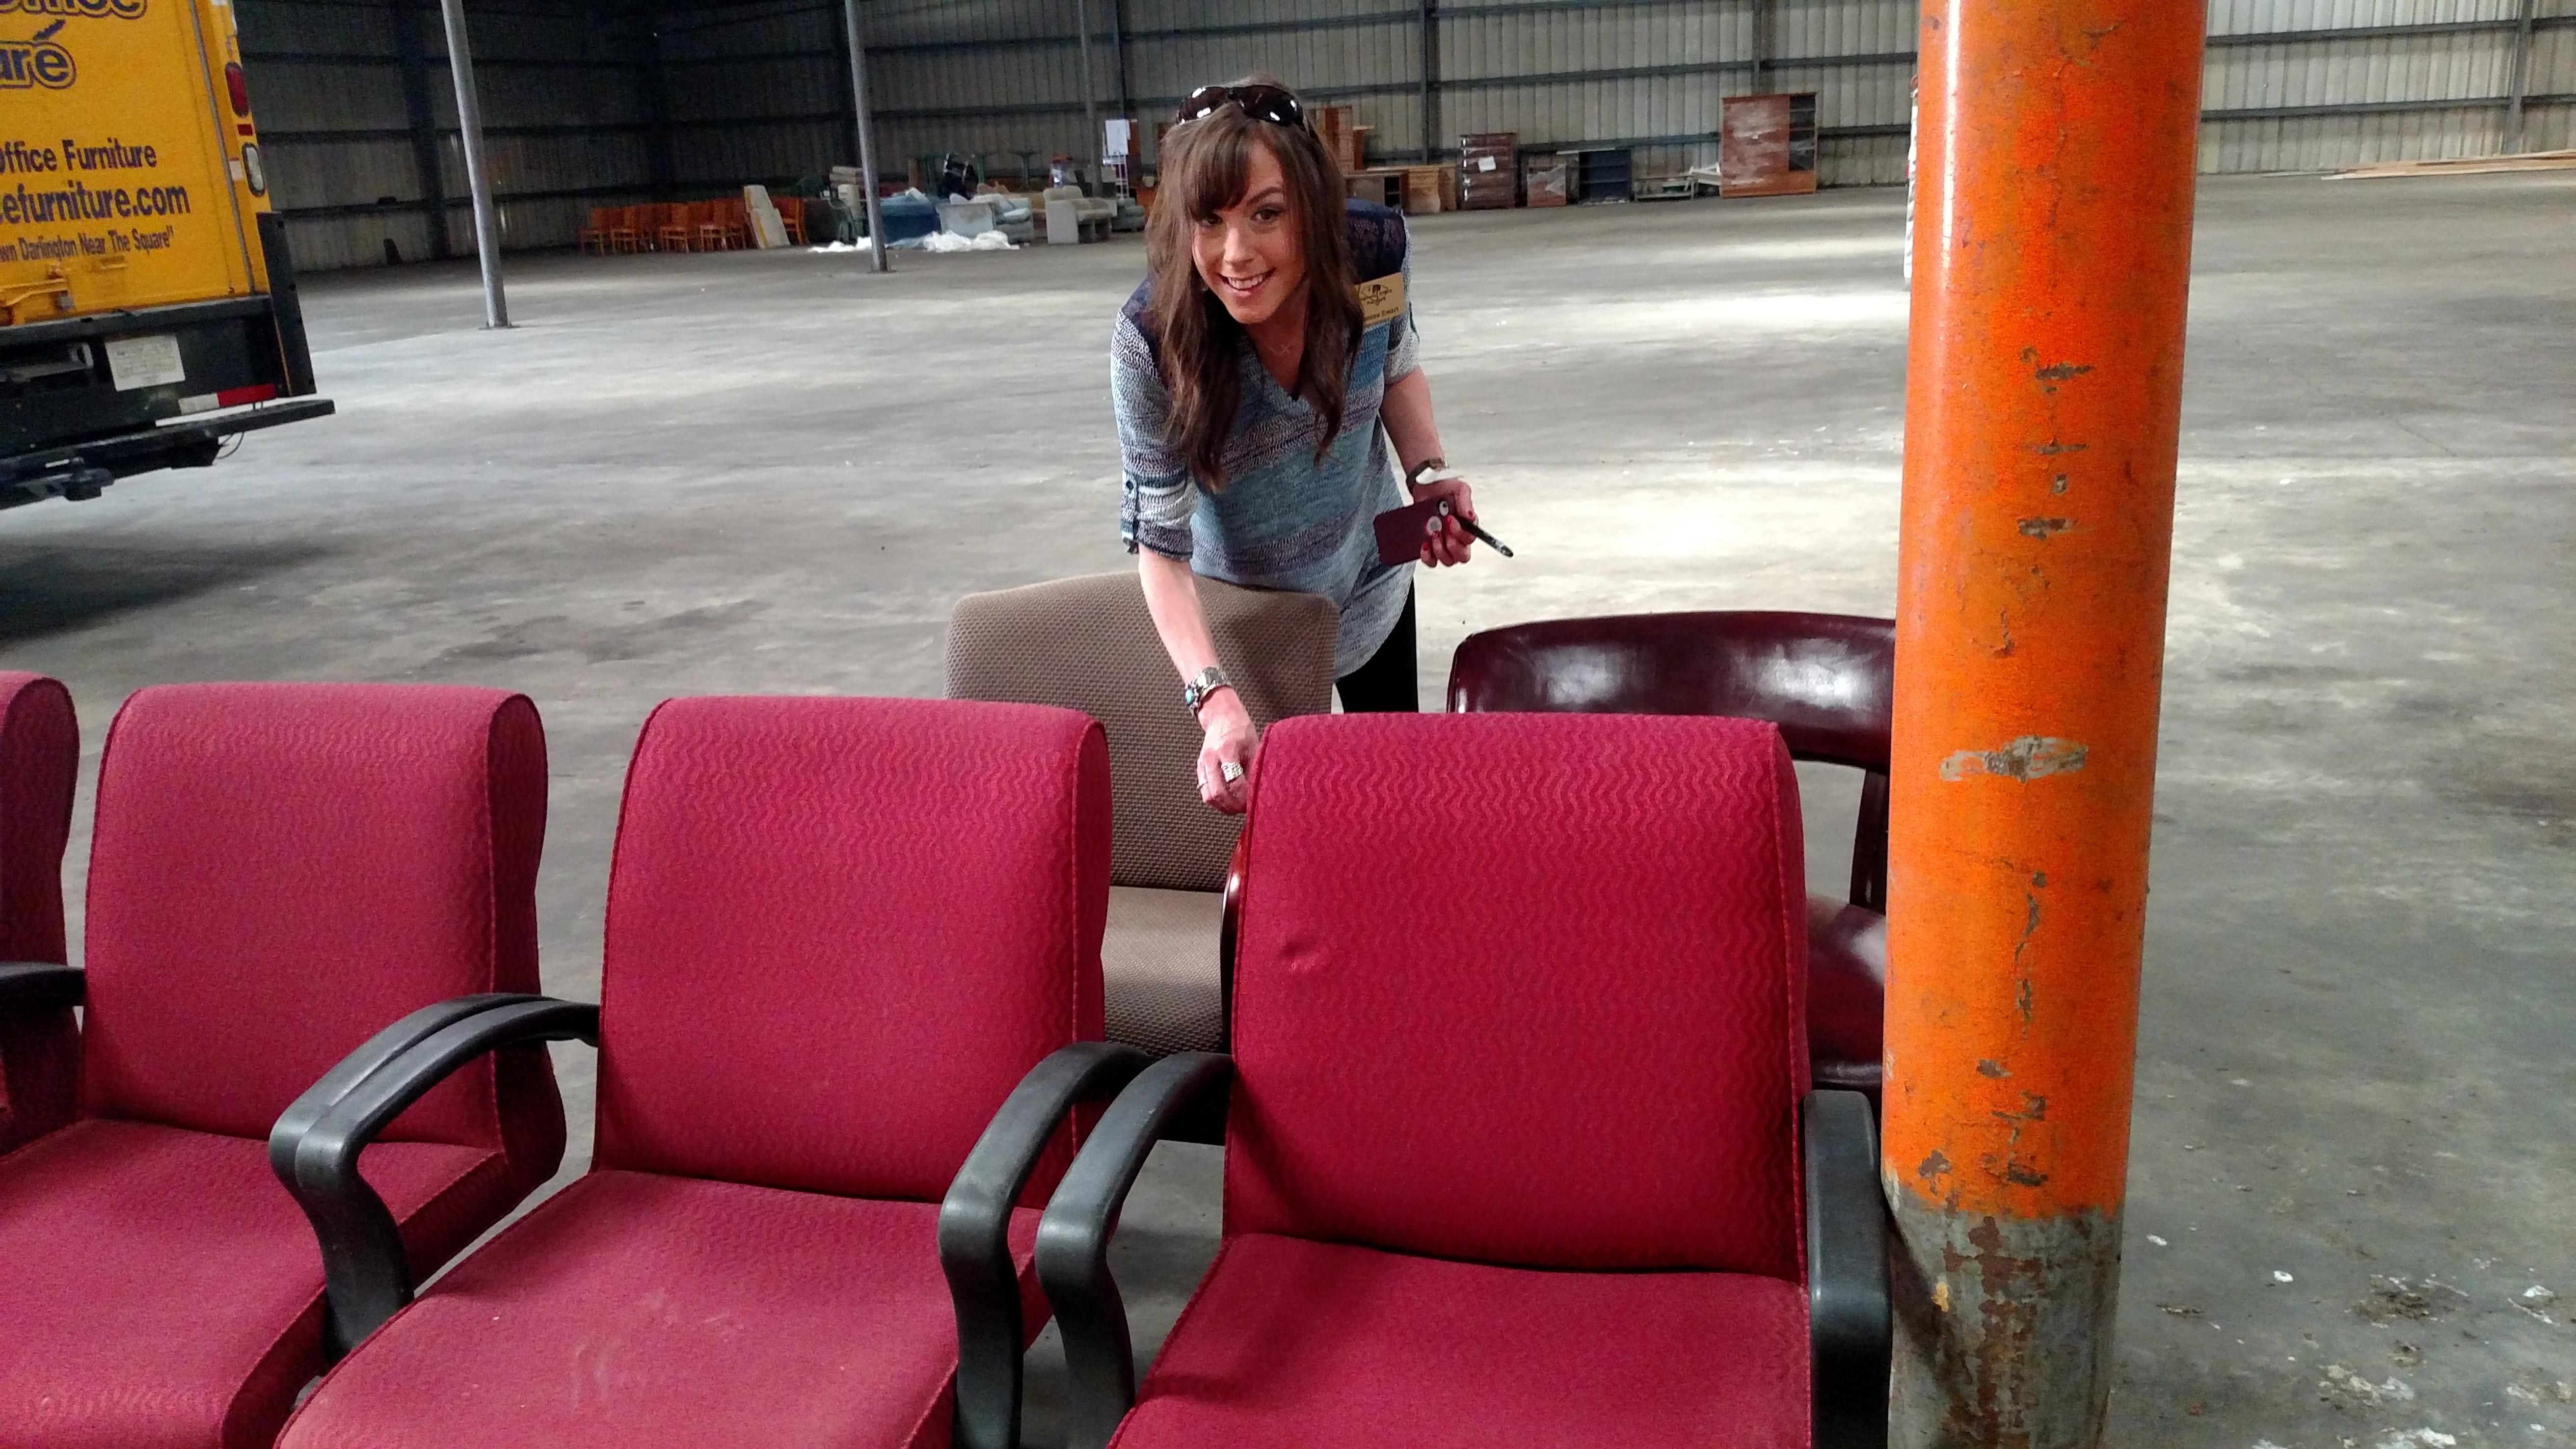 Palmetto Office Furniture 308 S Main St Darlington Sc 29532 Yp Com